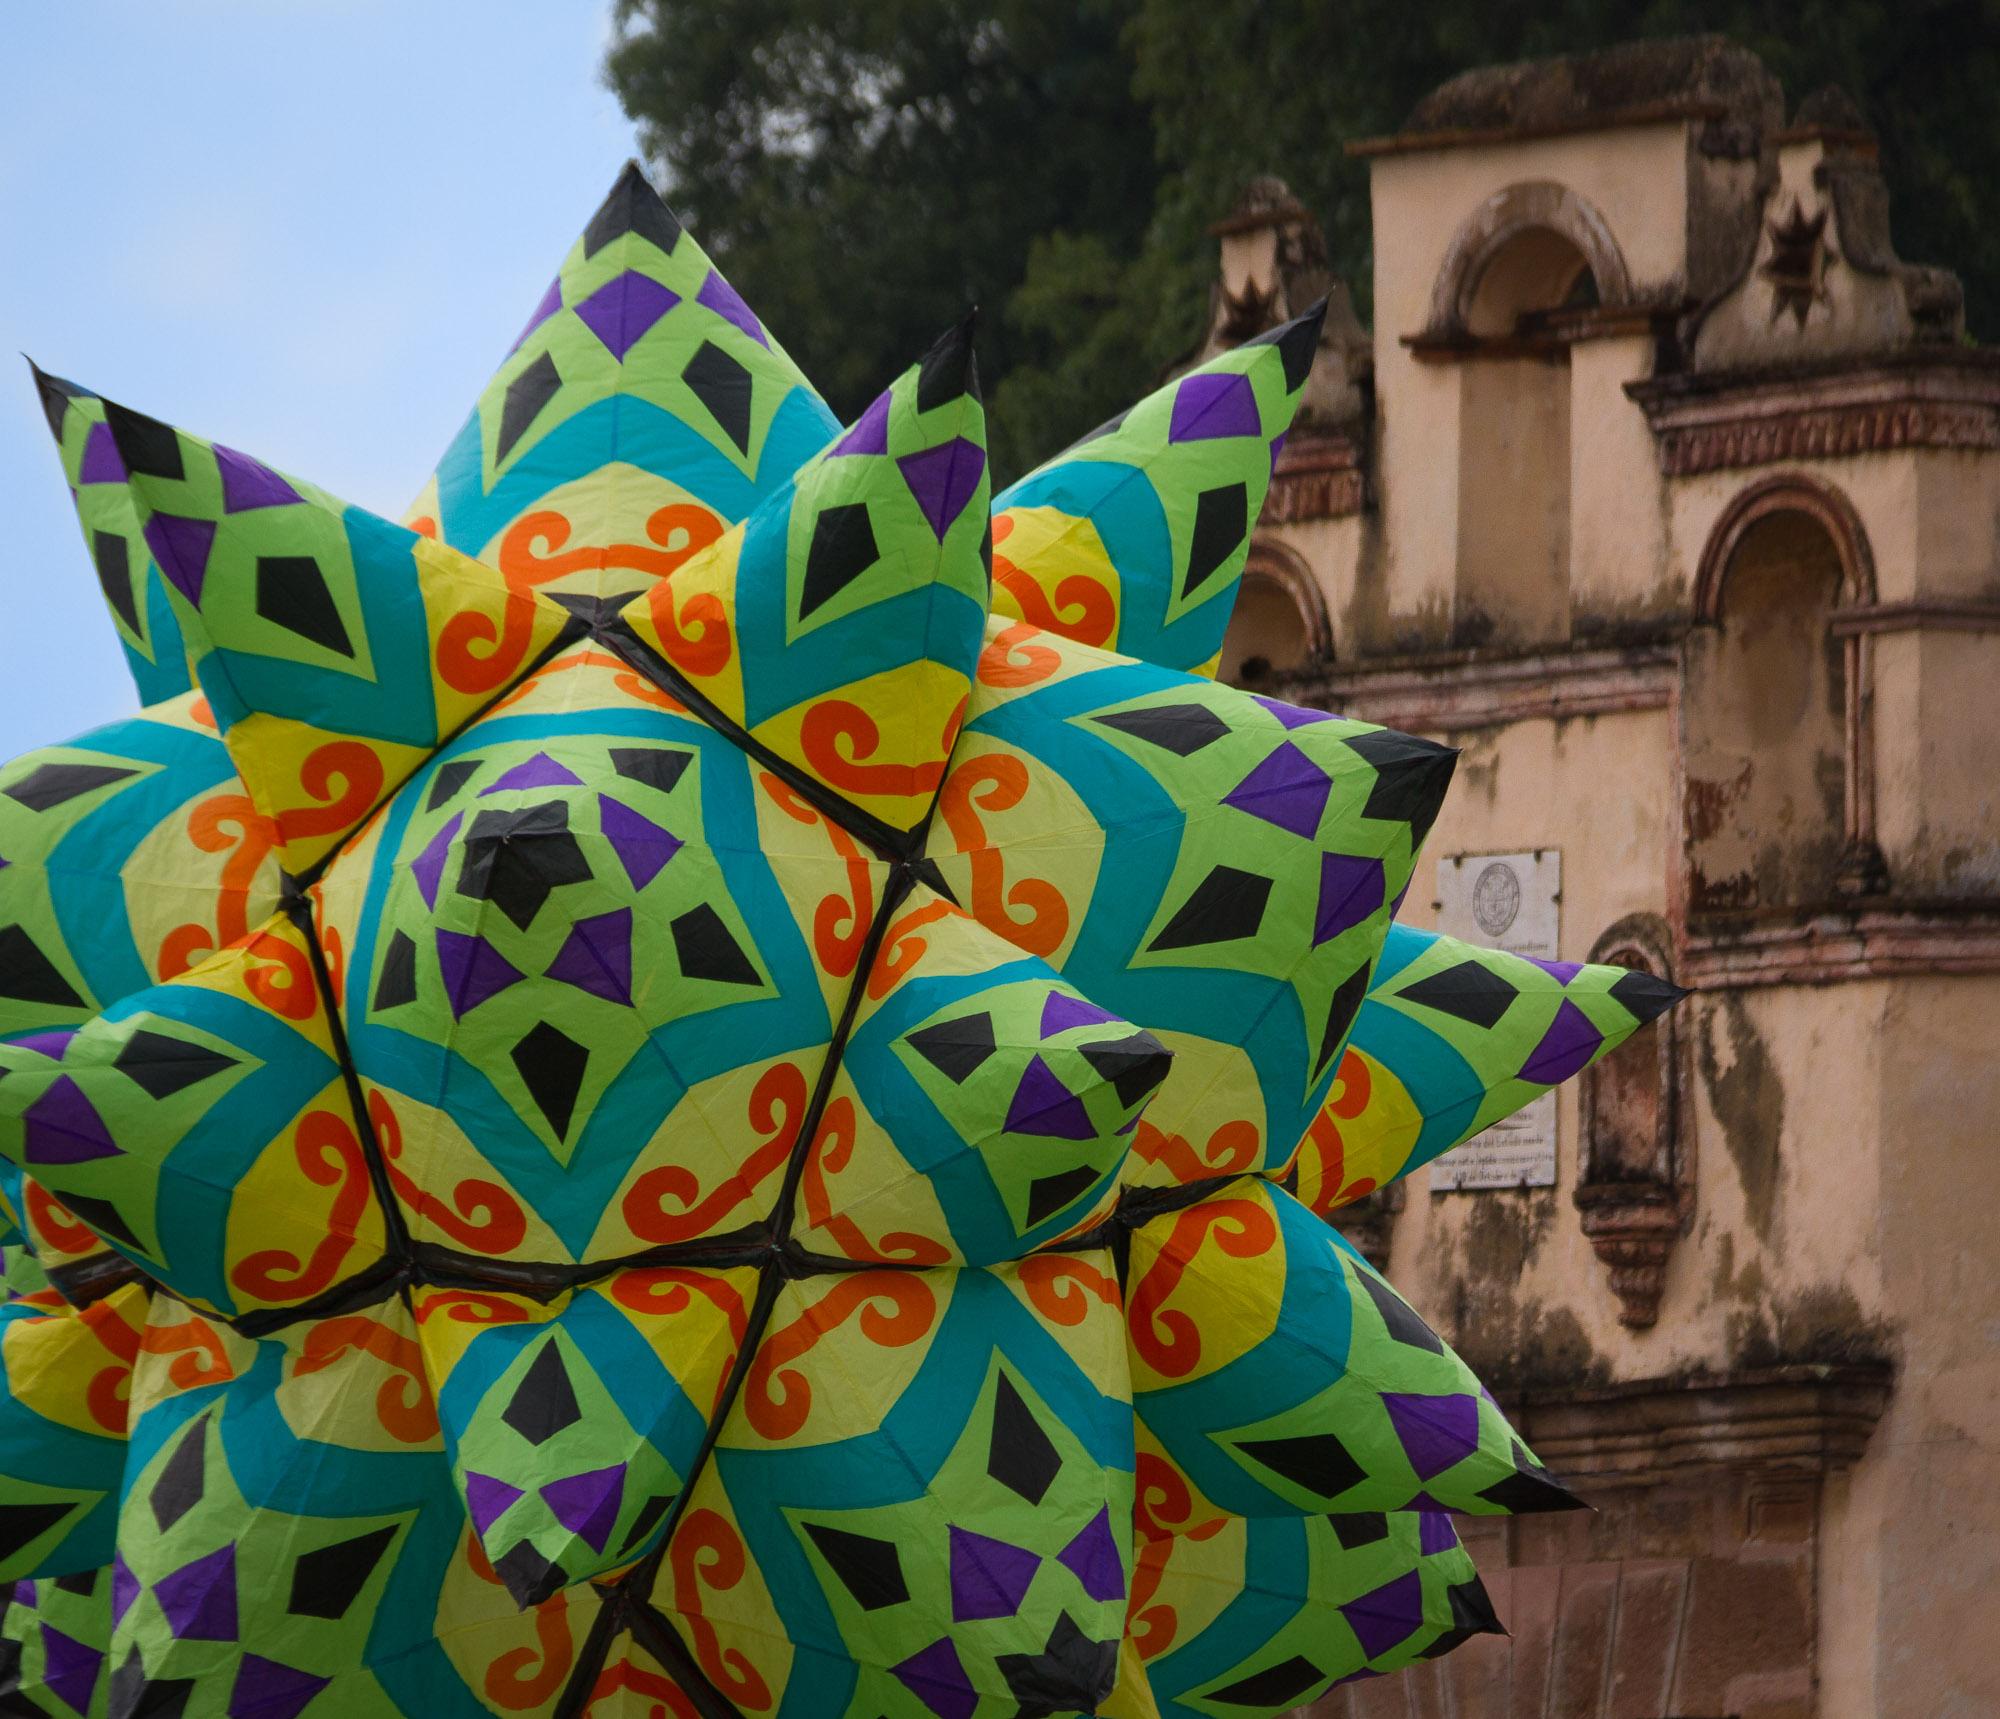 Sea Urchin   CantoyaFest: Pátzcuaro, Michoacán, Mexico — Sunday, July 23, 2017